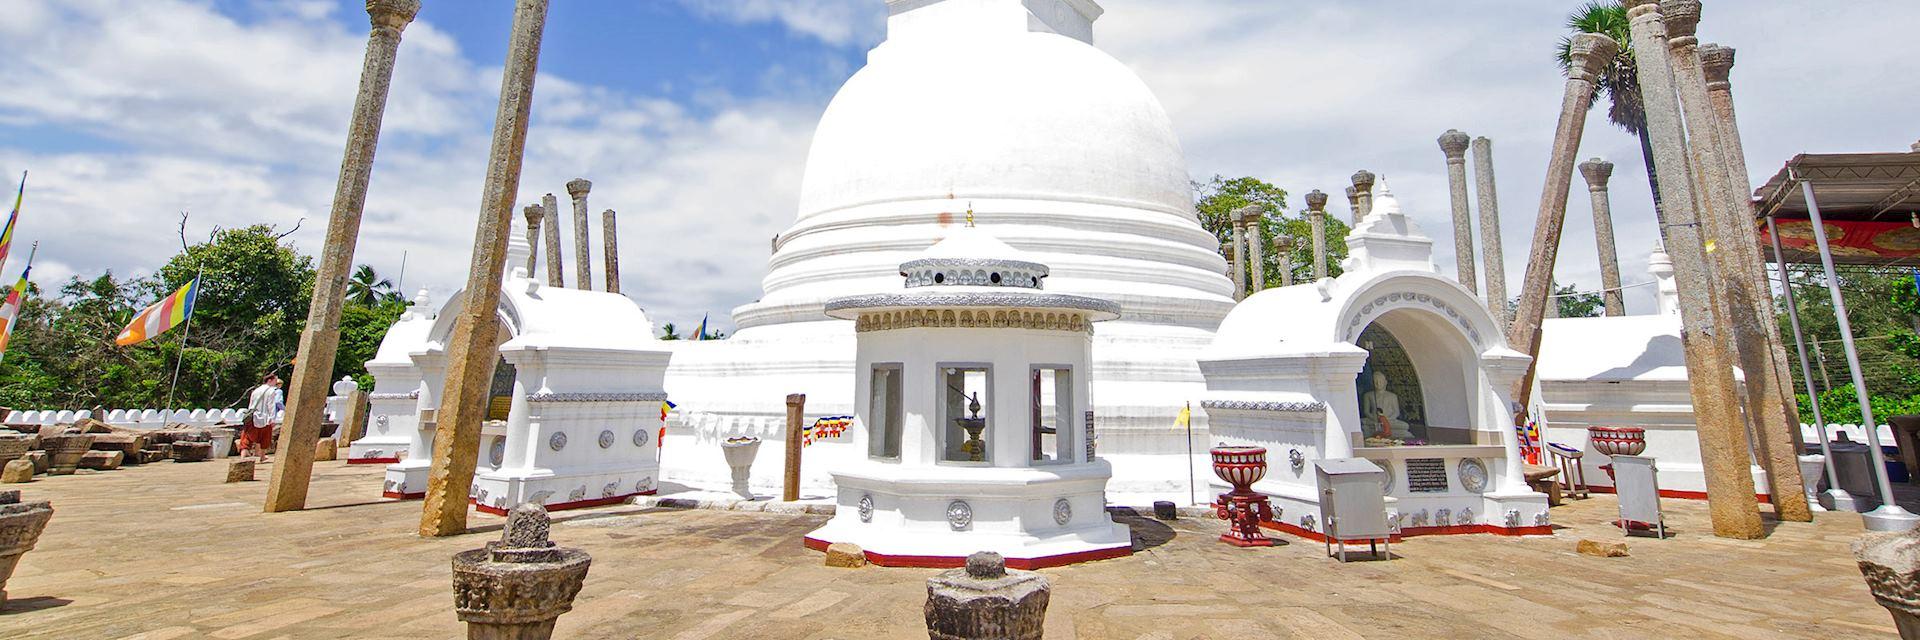 Thuparamaya Stupa, Anuradhapura